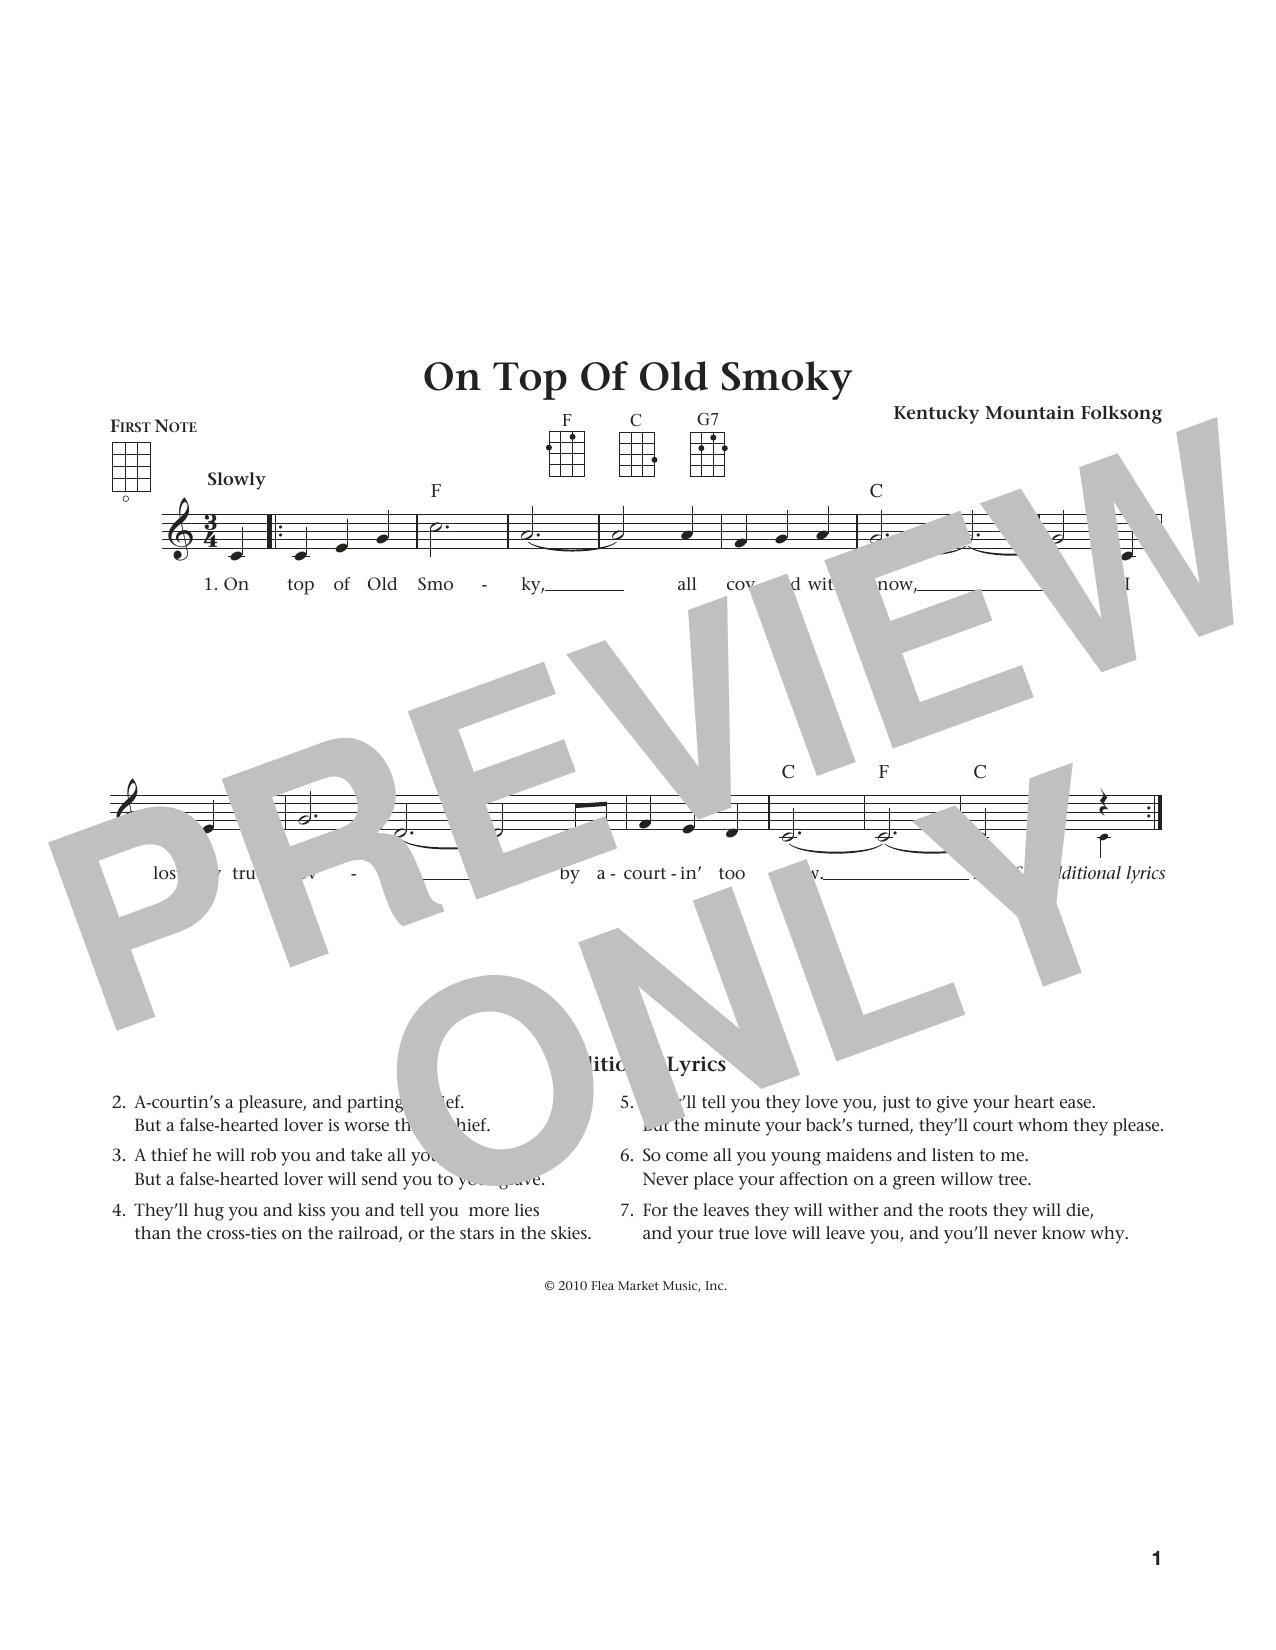 On Top Of Old Smoky (from The Daily Ukulele) (arr. Liz and Jim Beloff) (Ukulele)